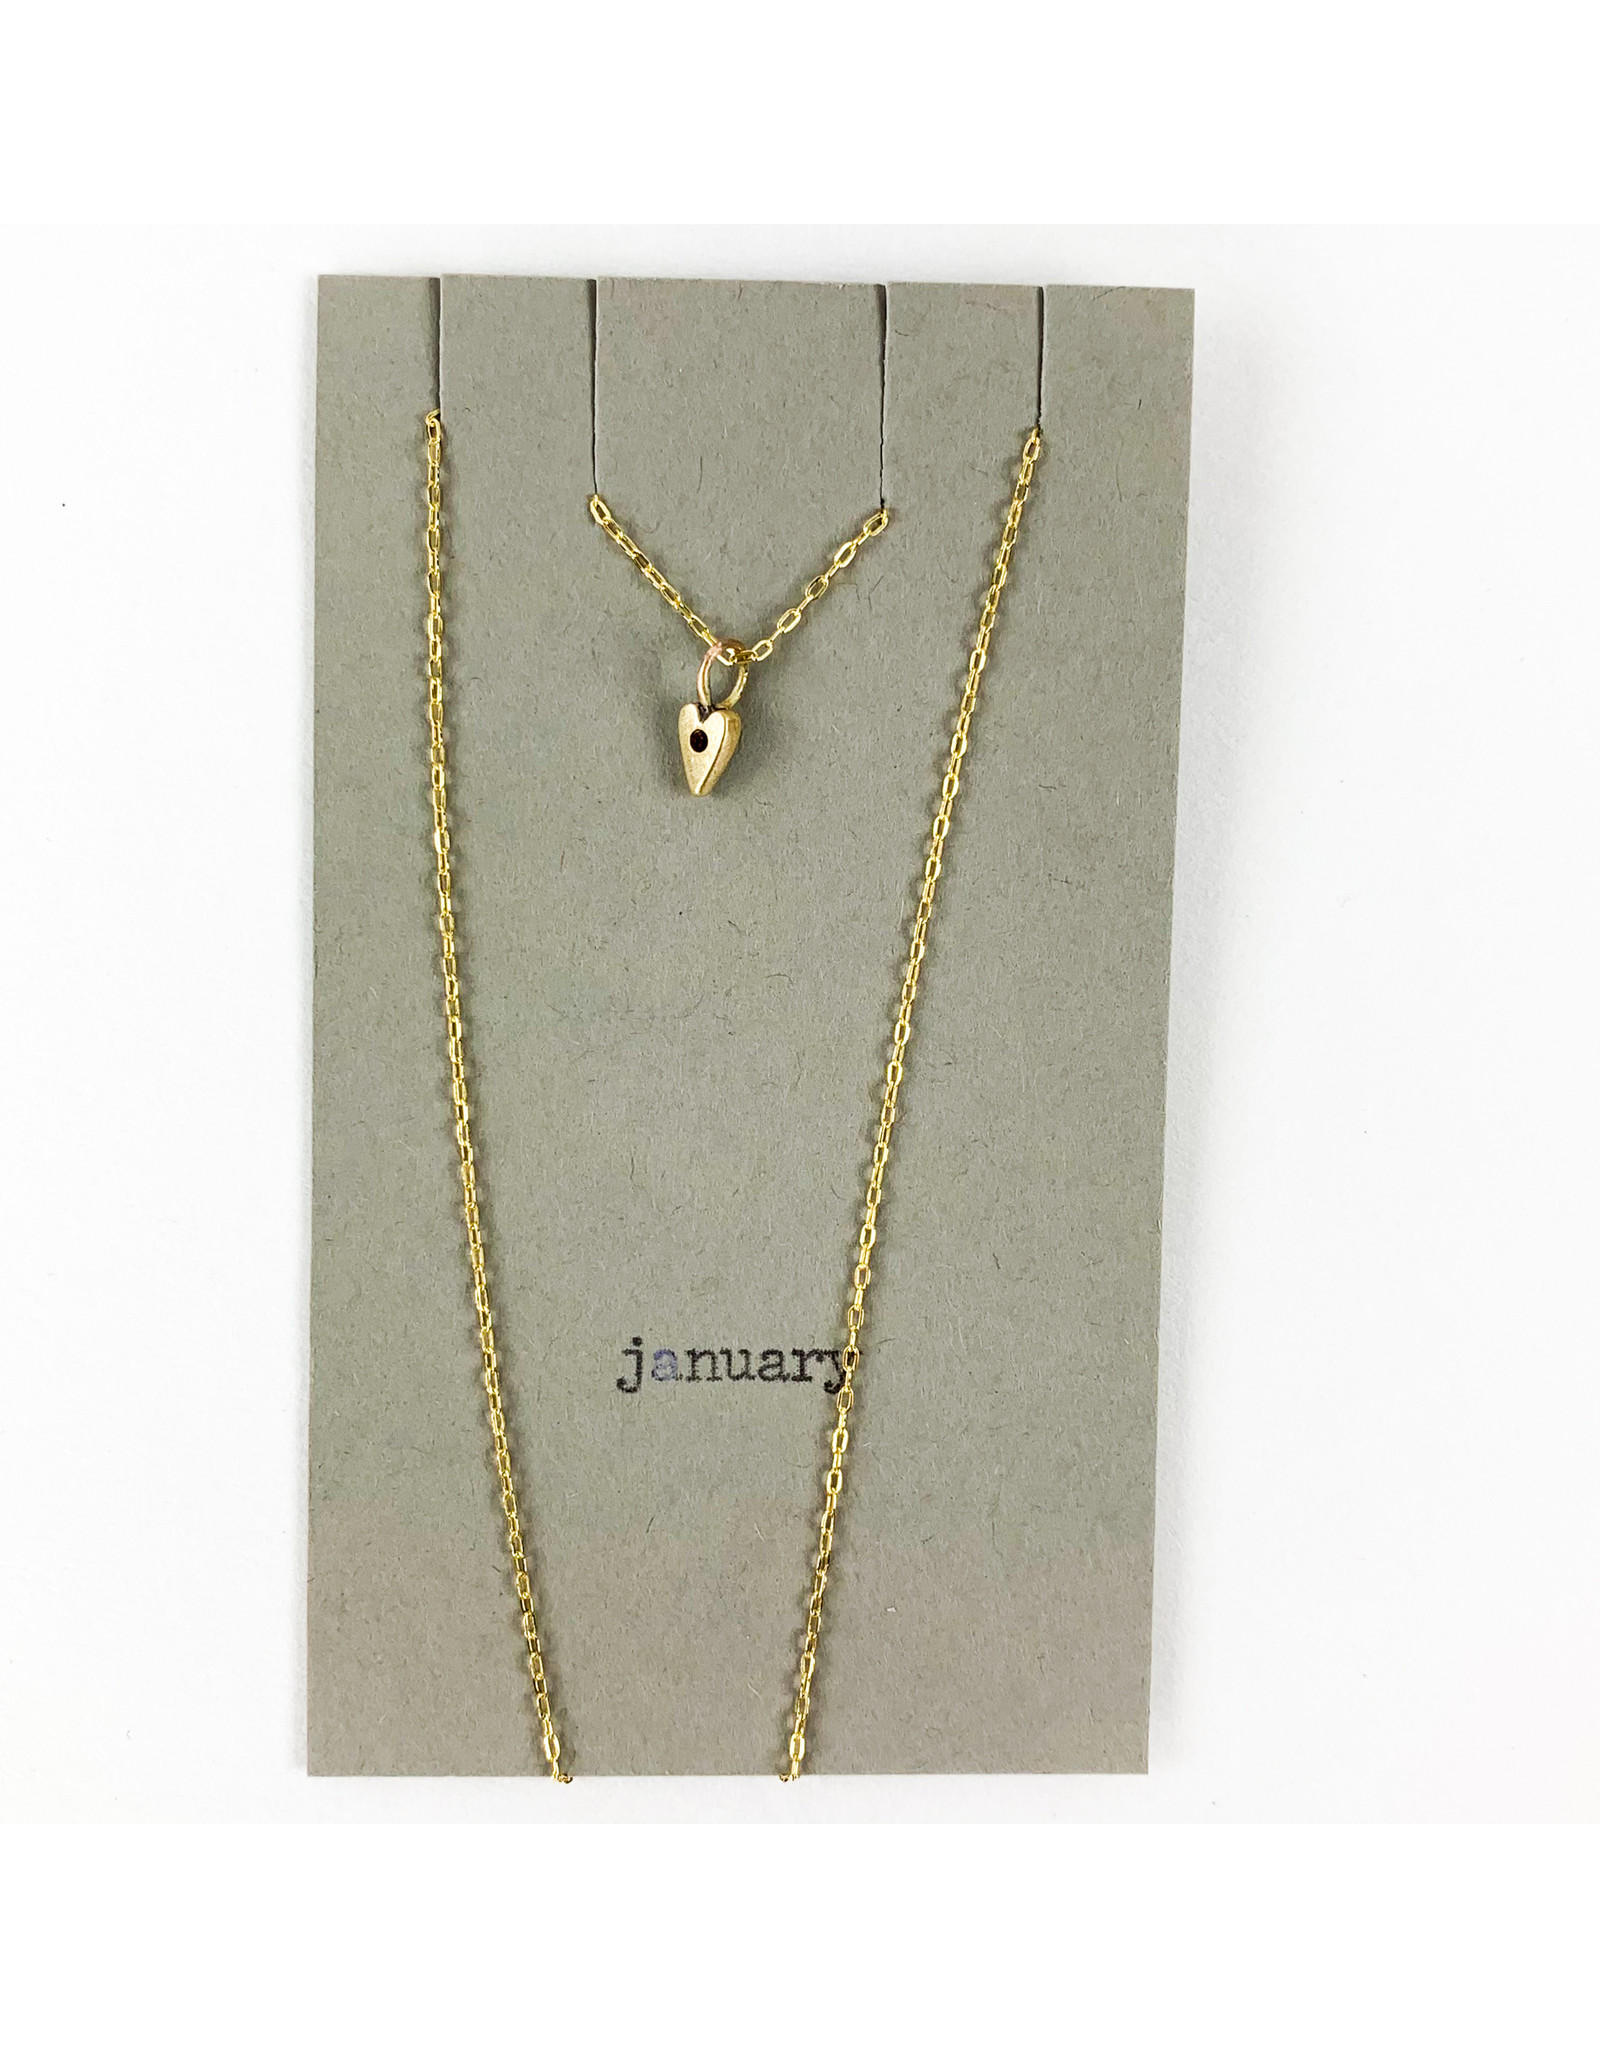 penny larsen January Necklace/ Garnet Gold Chain